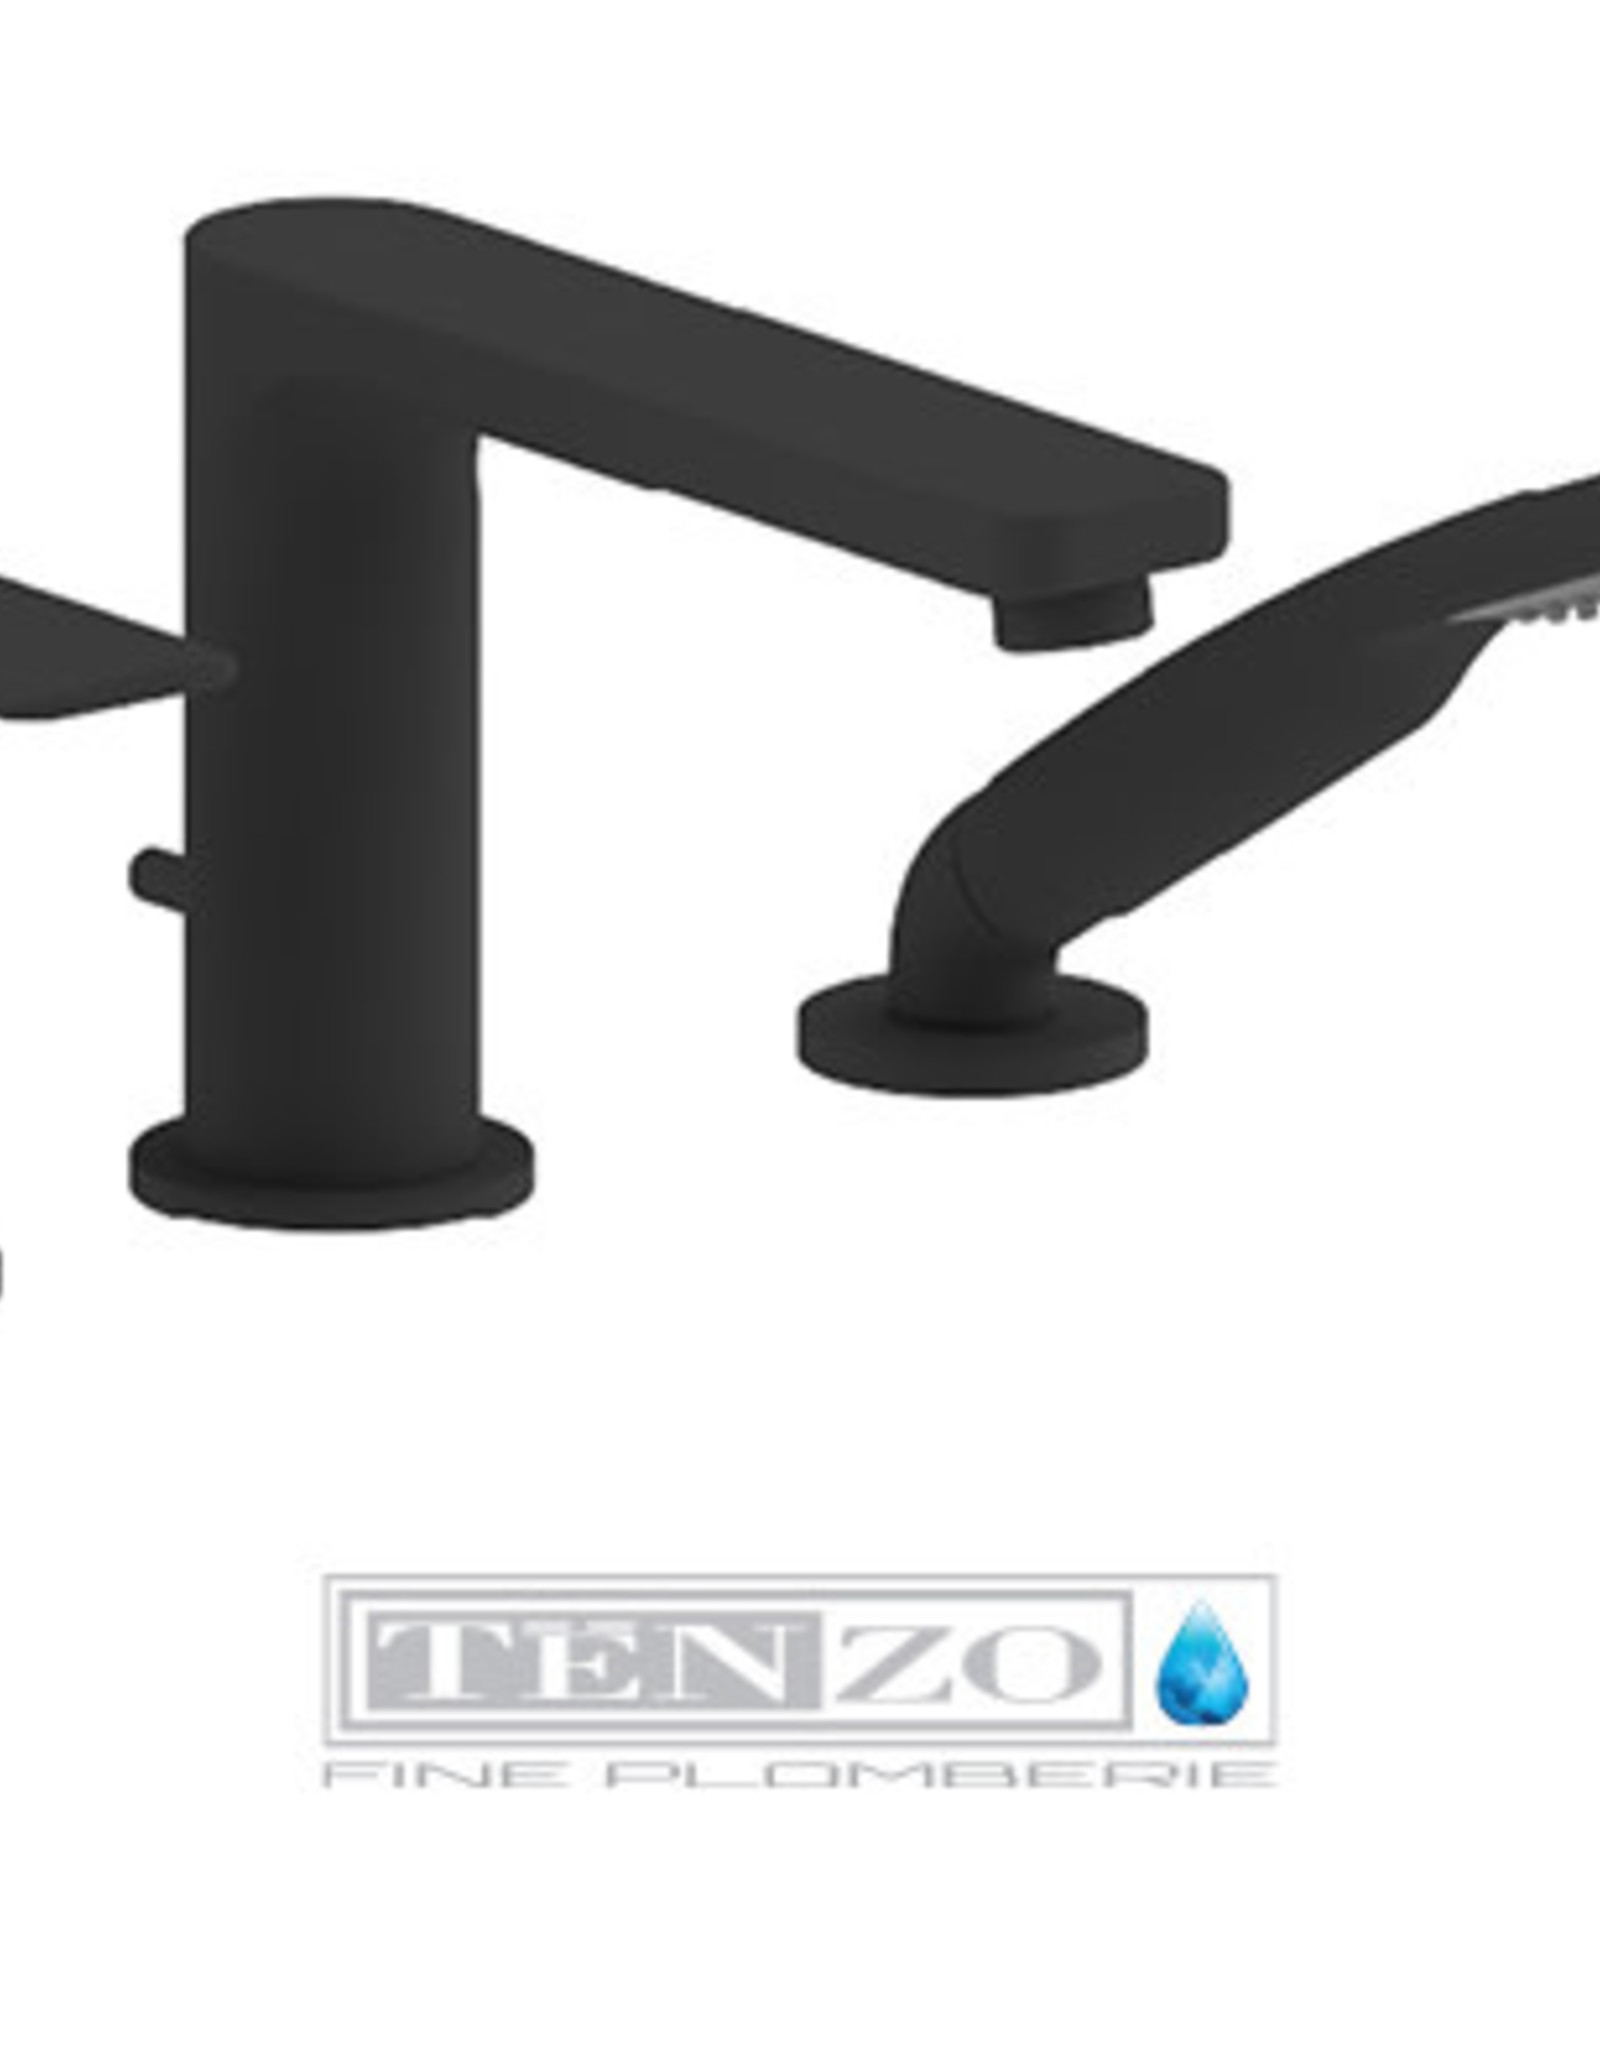 Tenzo Tenzo Delano 3pc Tub Filler